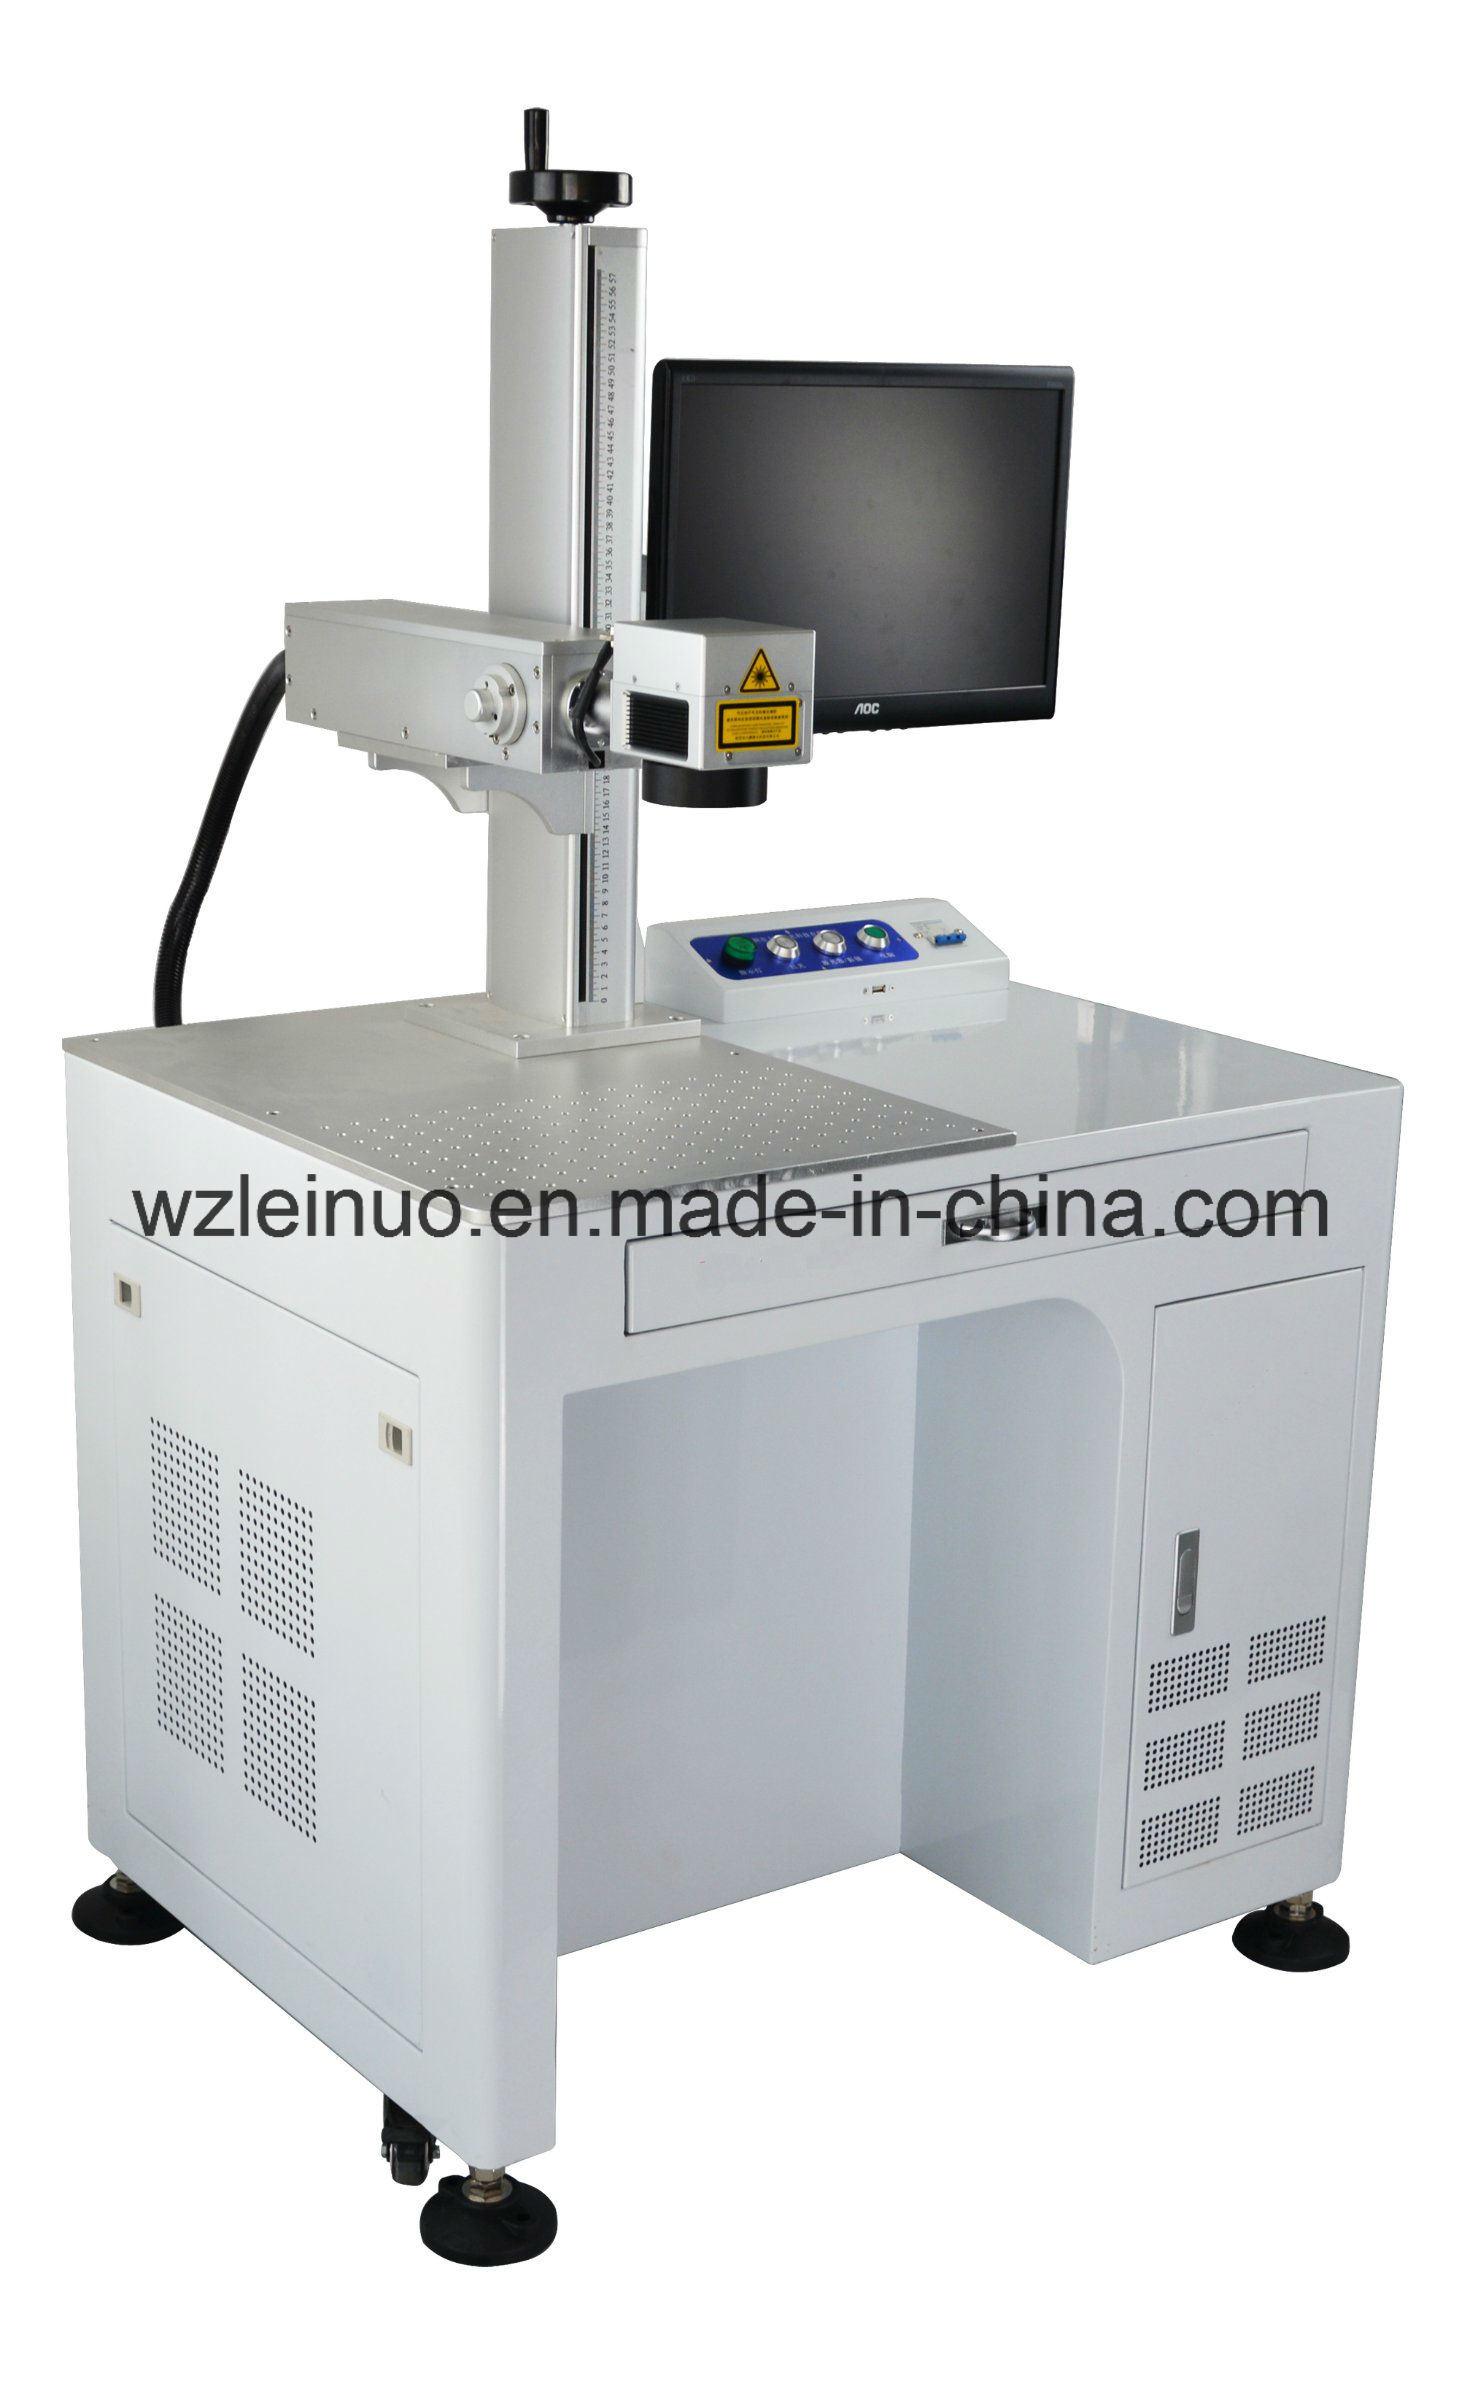 30W Optical Fiber Laser Marking Machine for Package